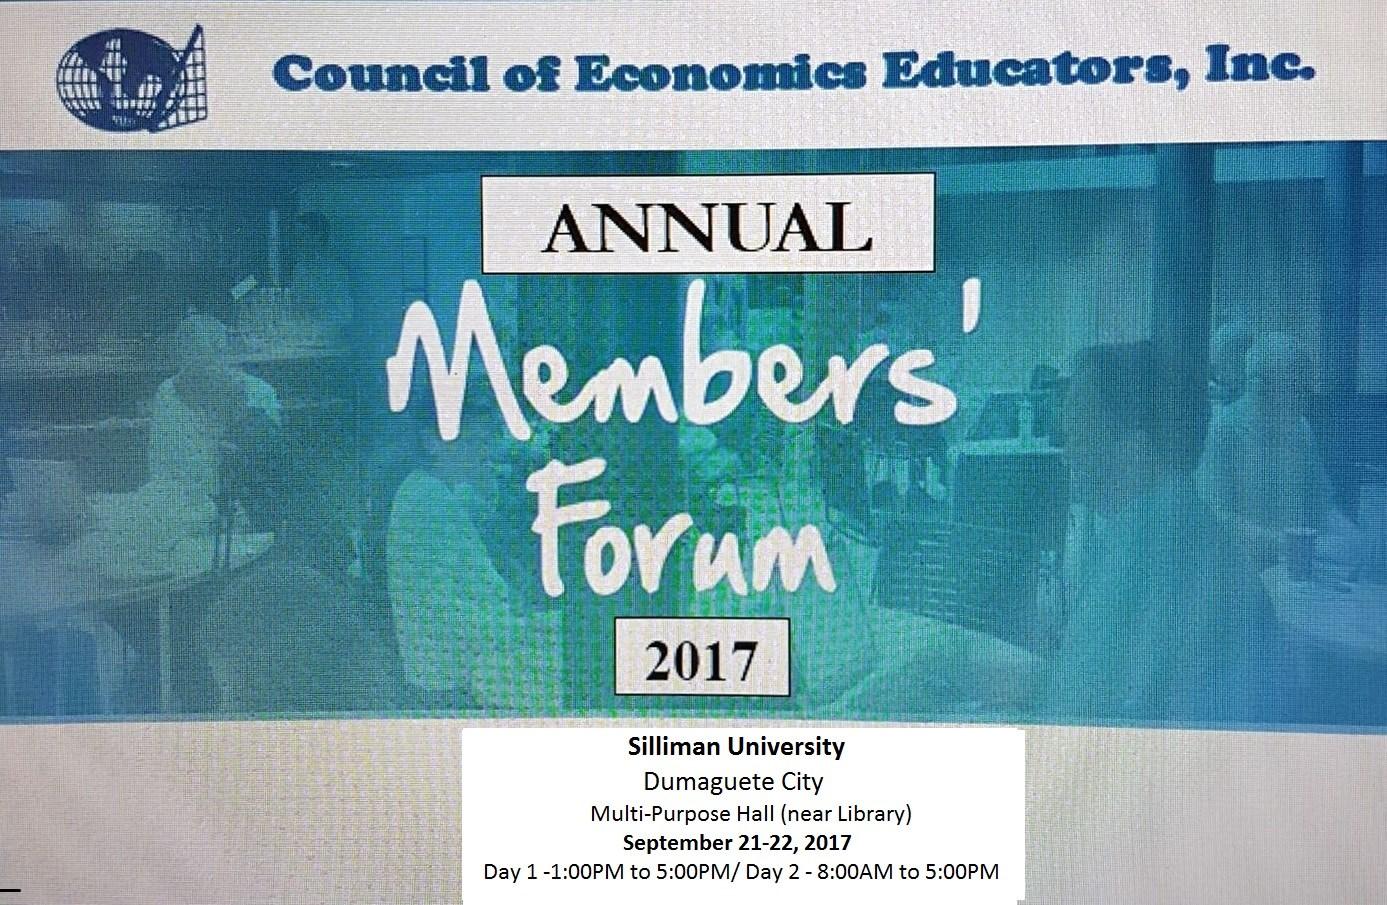 CECON Annual Visayas Regional Members' Forum & Seminar-Workshop